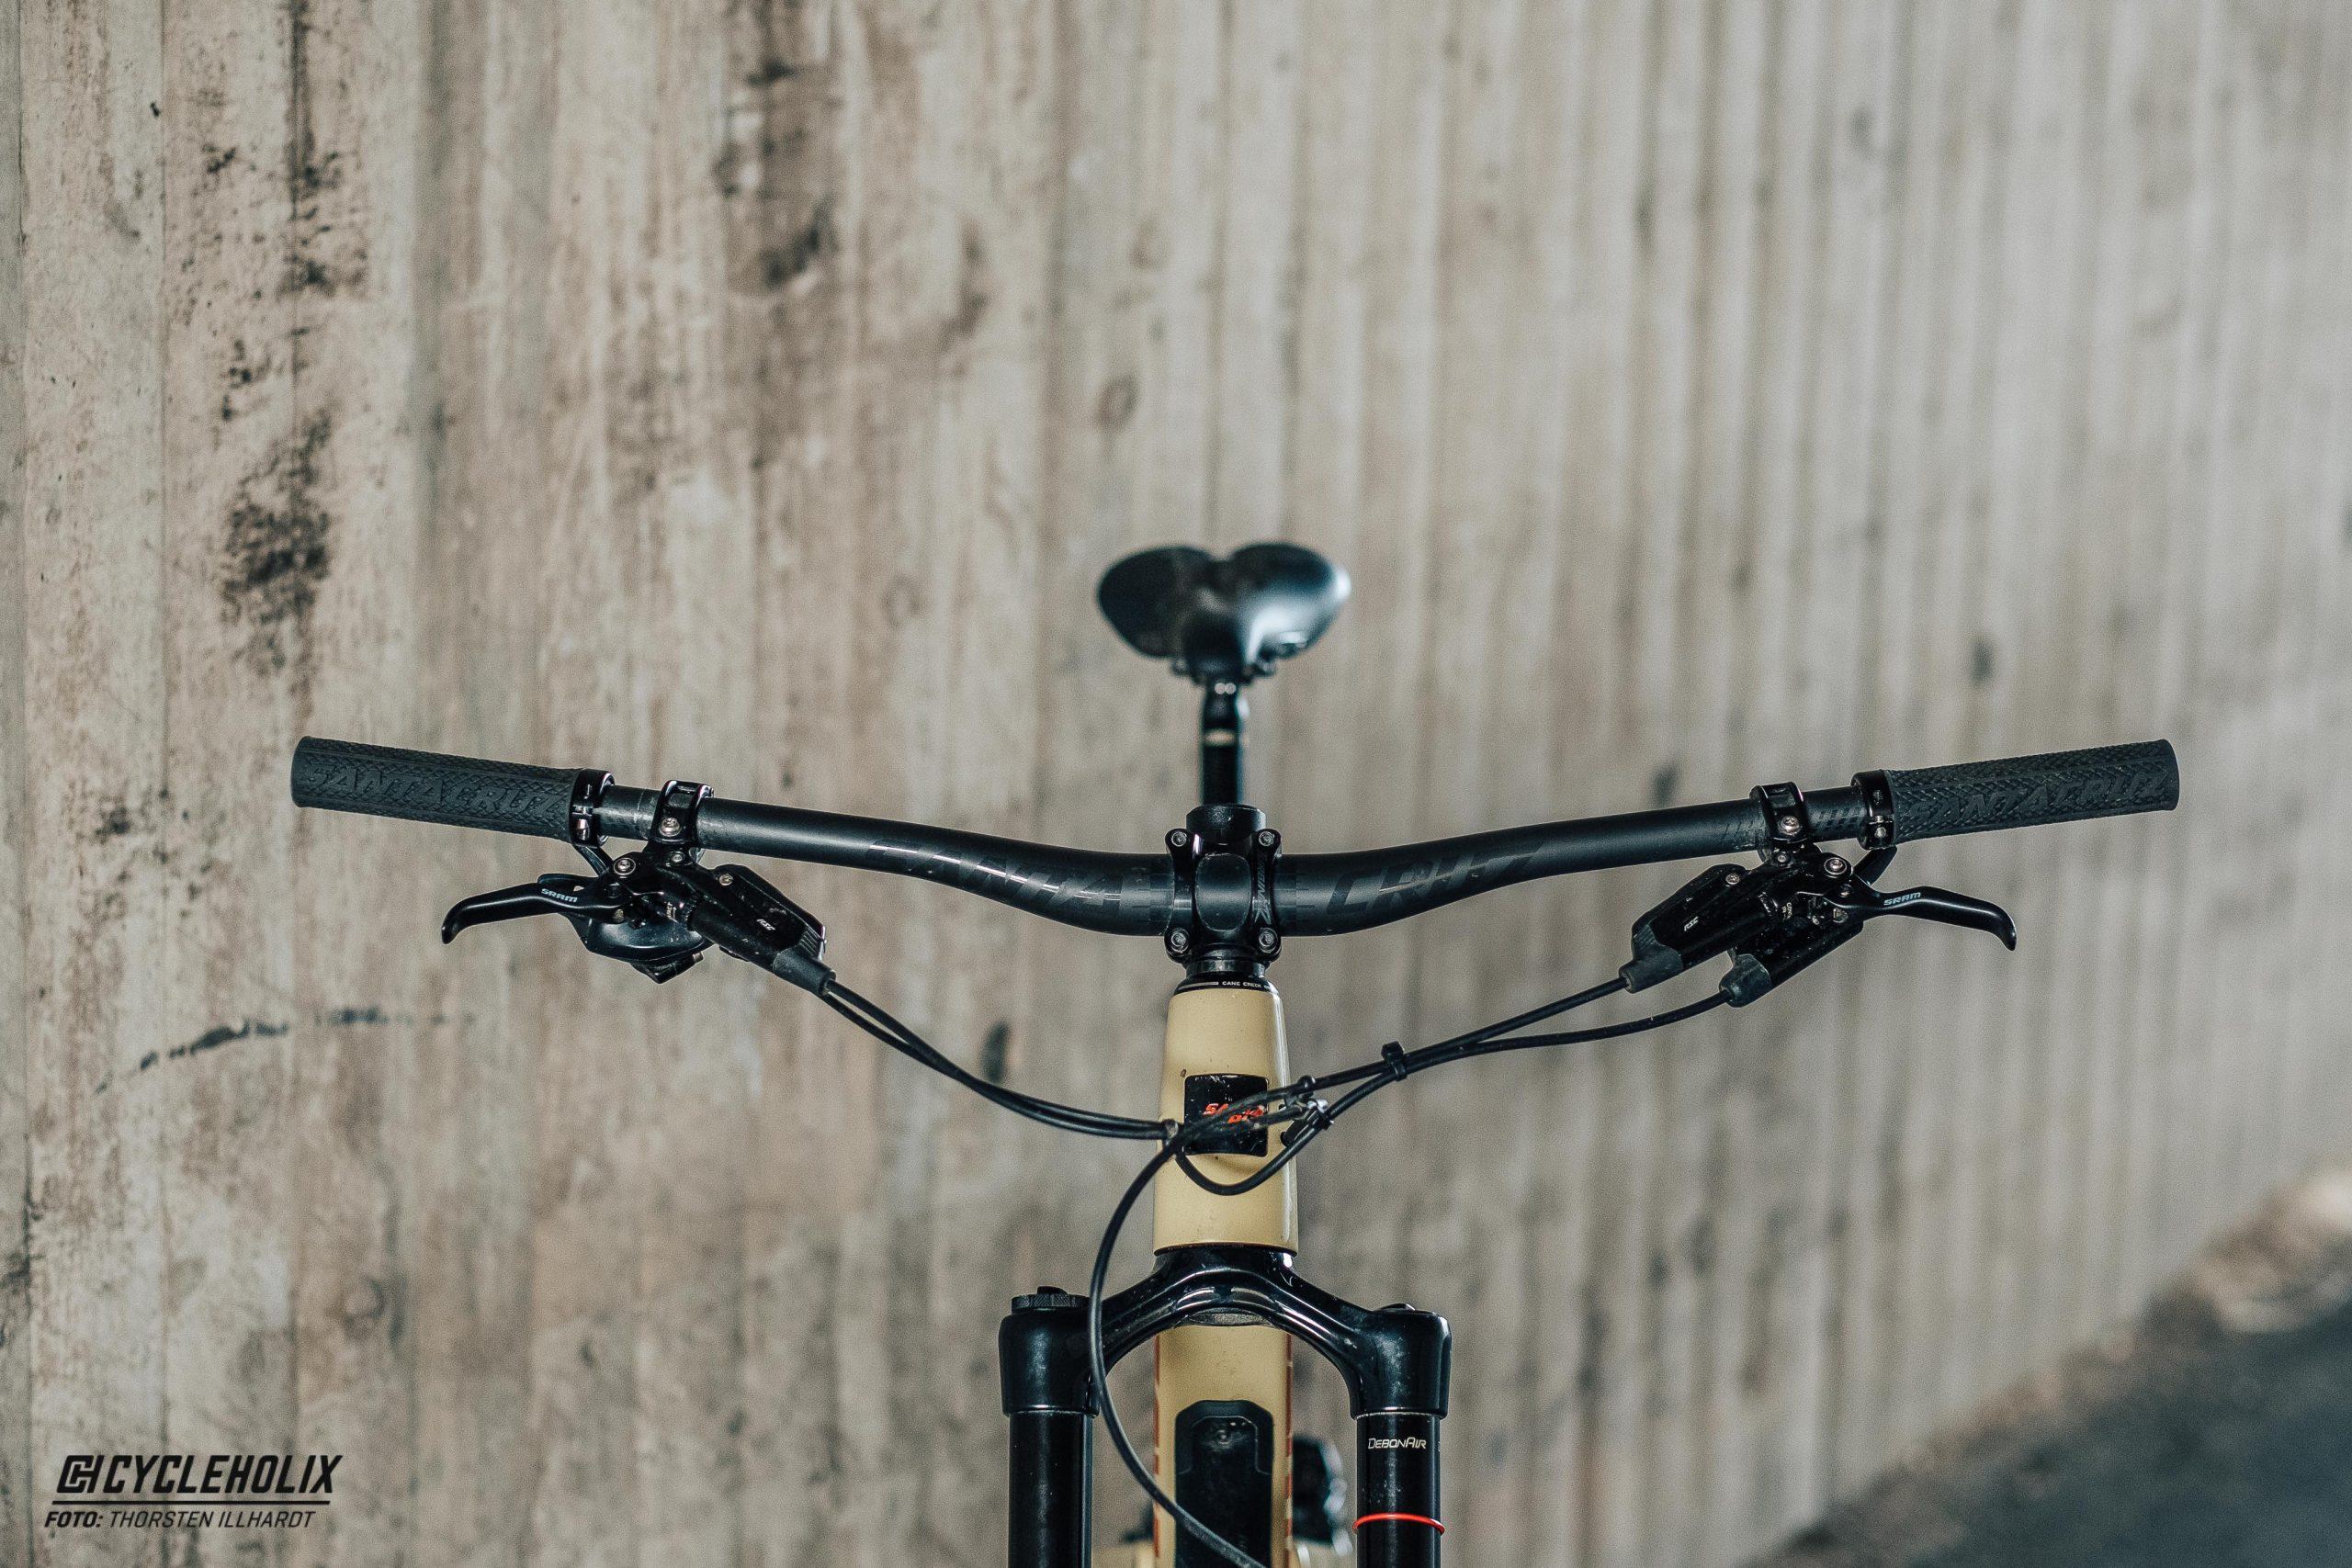 Hightower Action 7325 scaled Cycleholix